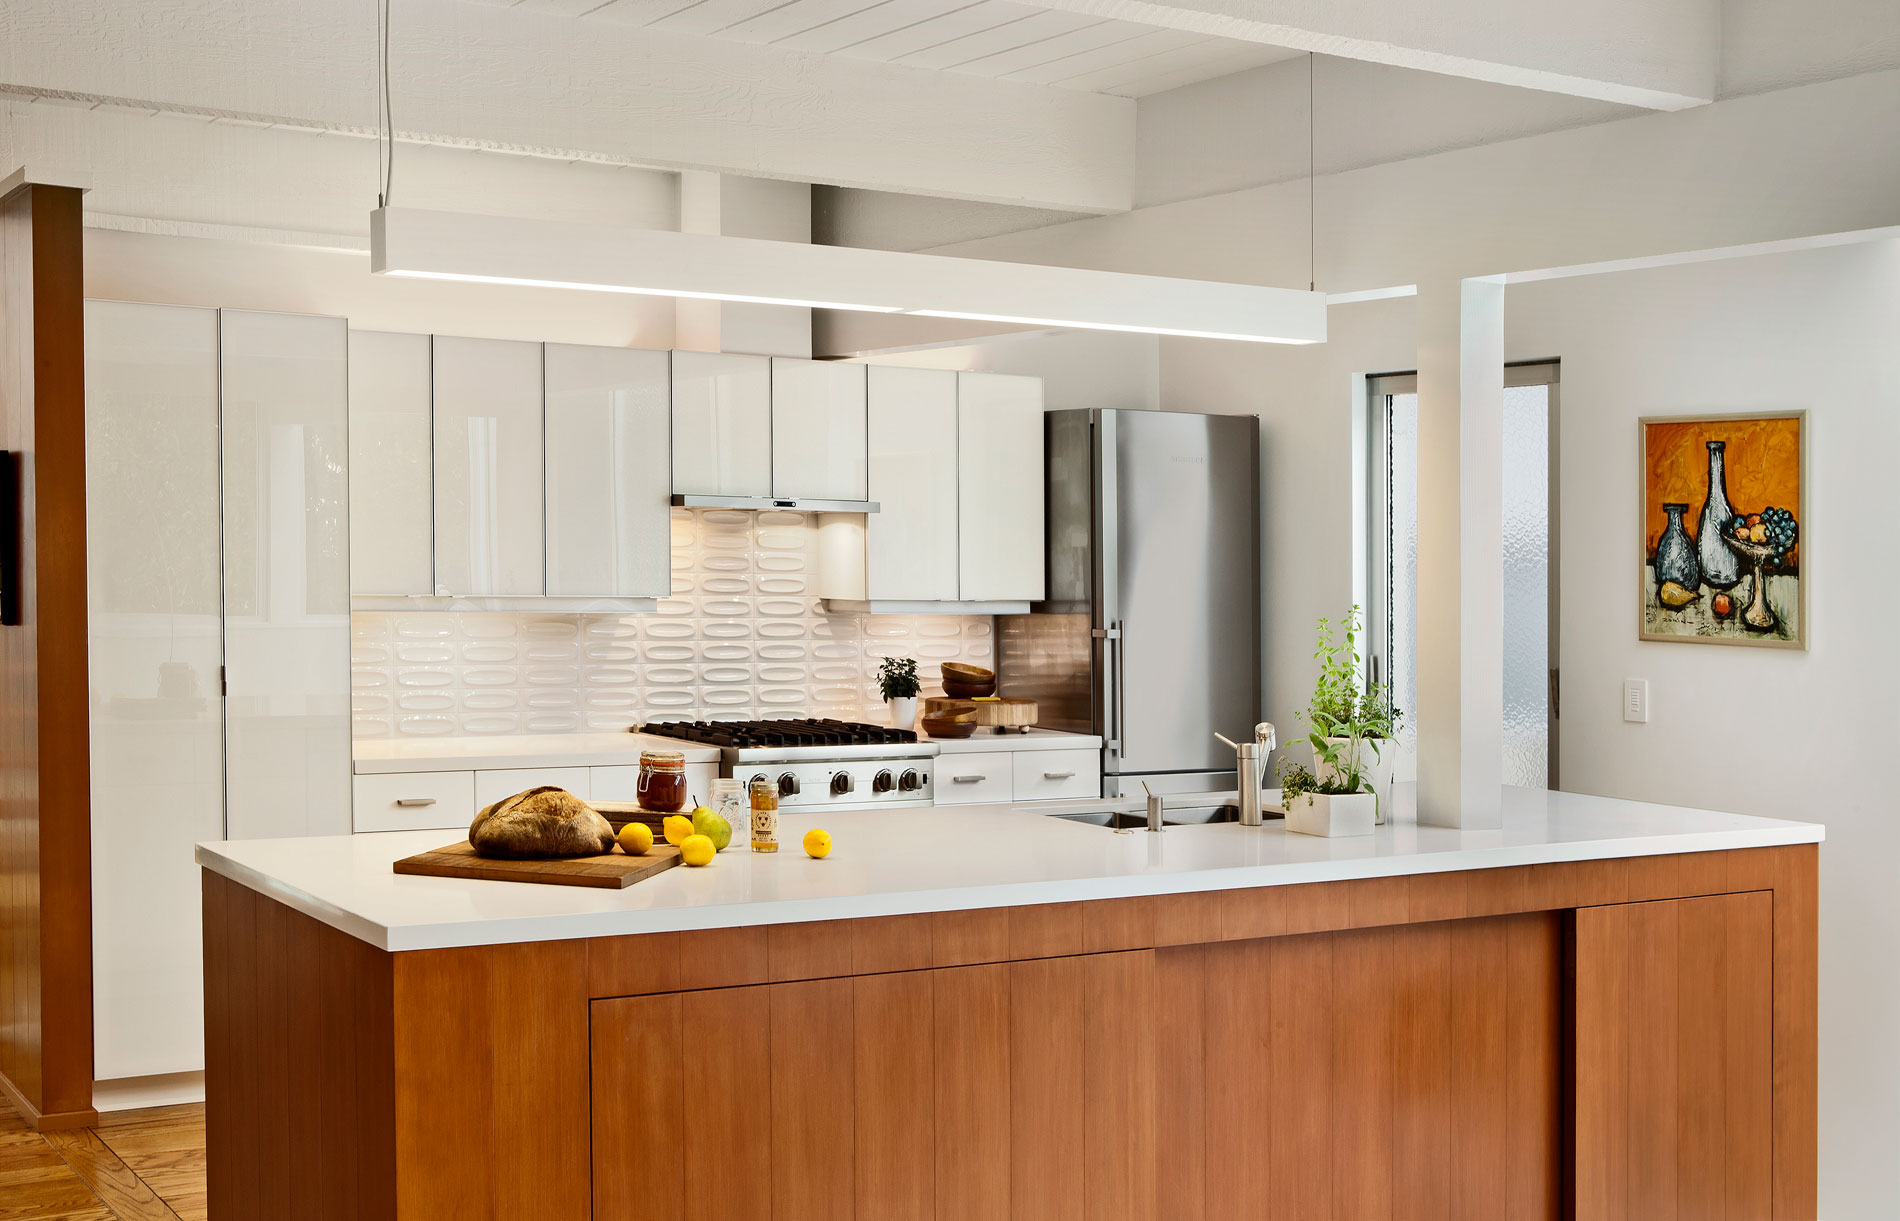 Carmel Mid-Century LEED Home by Studio Schicketanz-10